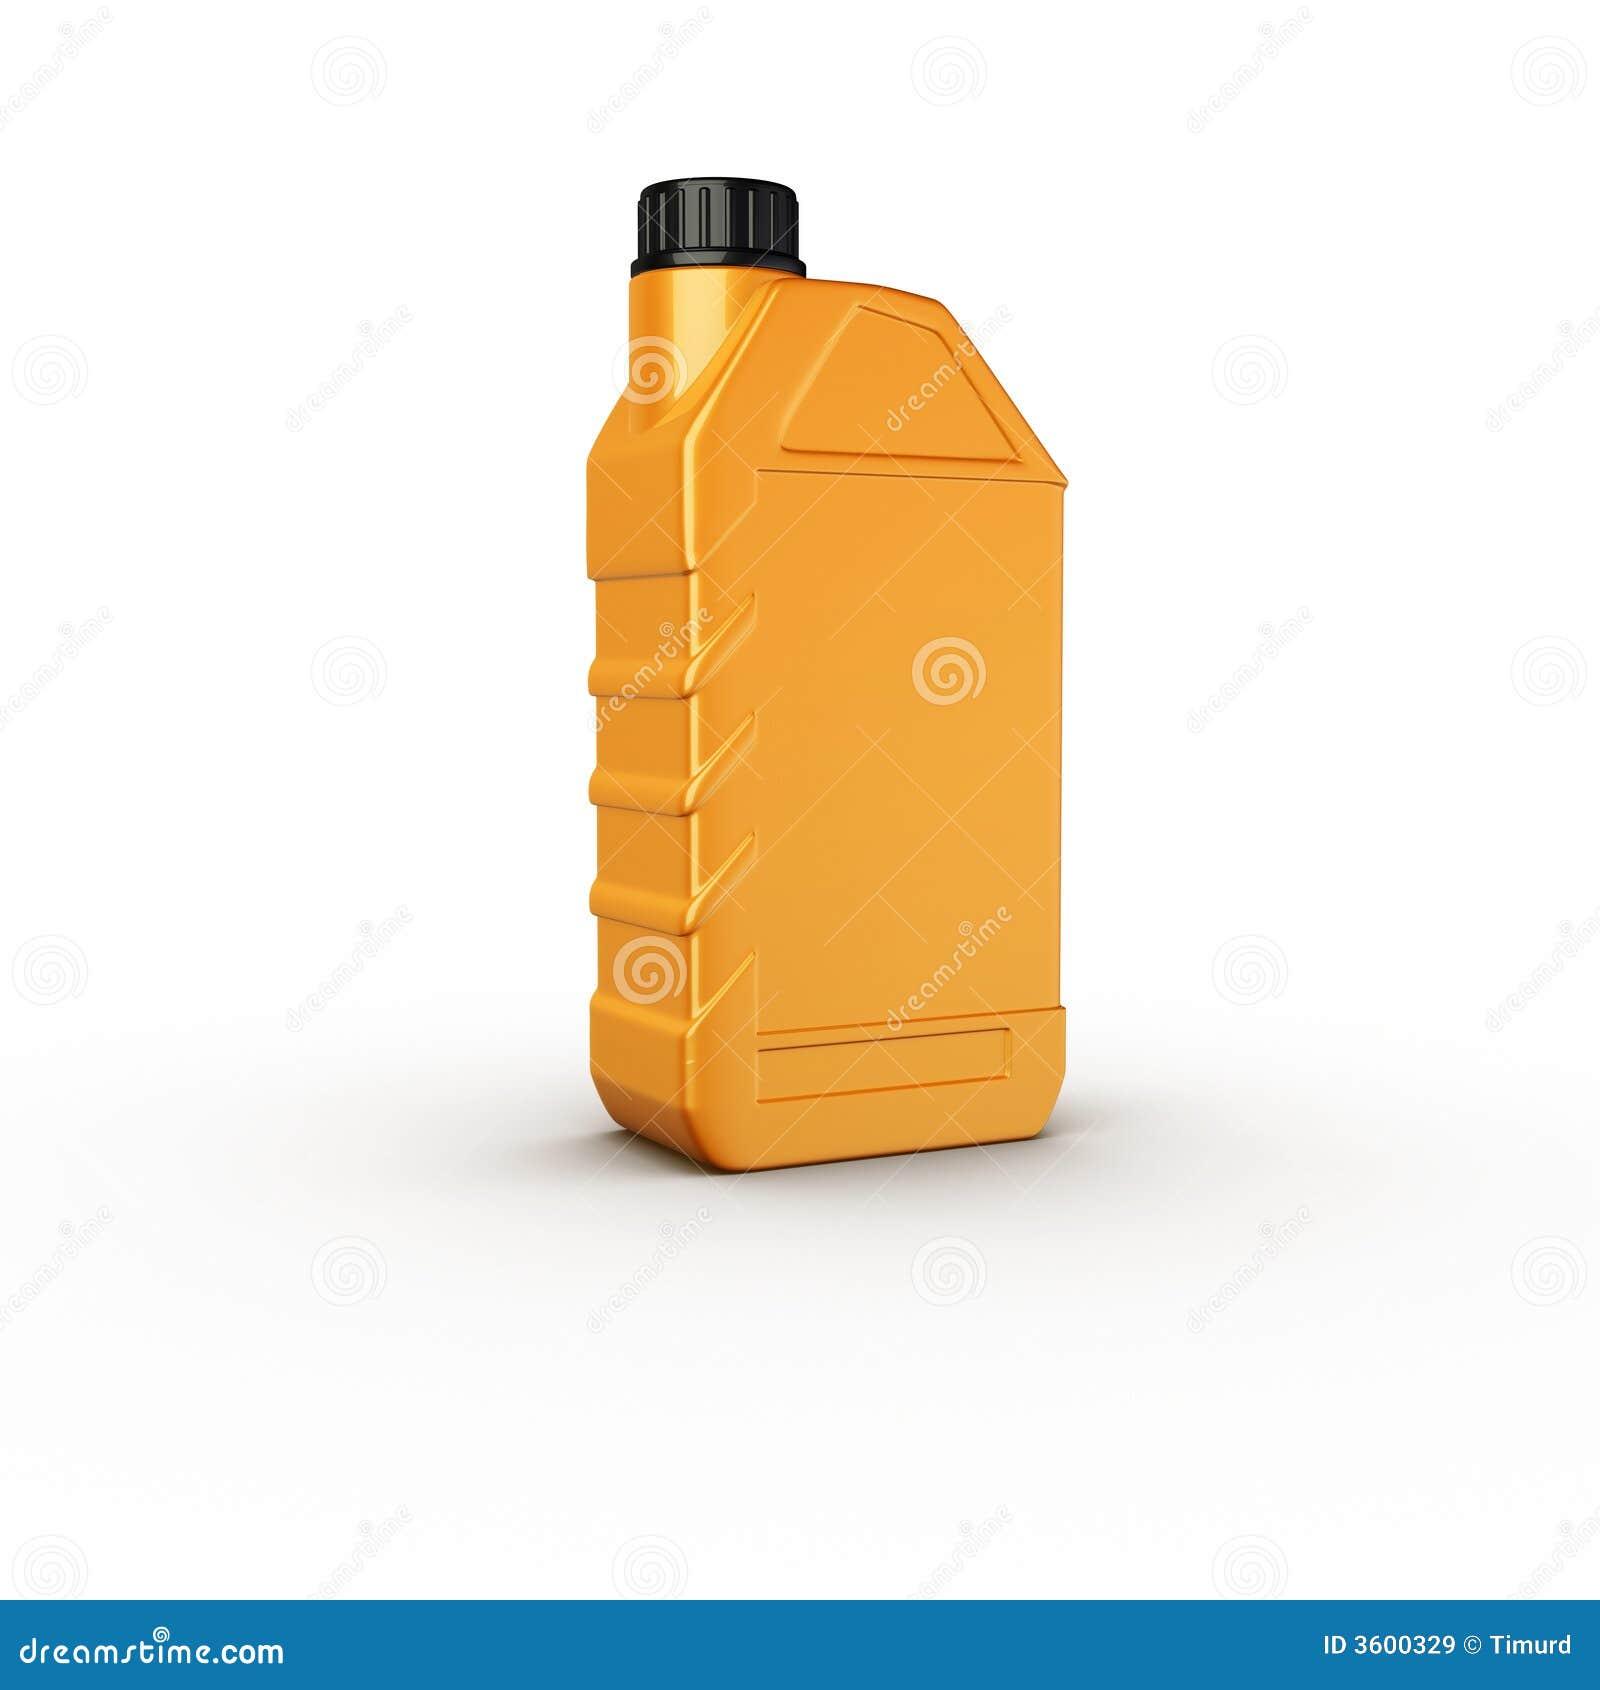 Motor oil bottle stock image image of close bottle for Motor oil plastic bottle manufacturer